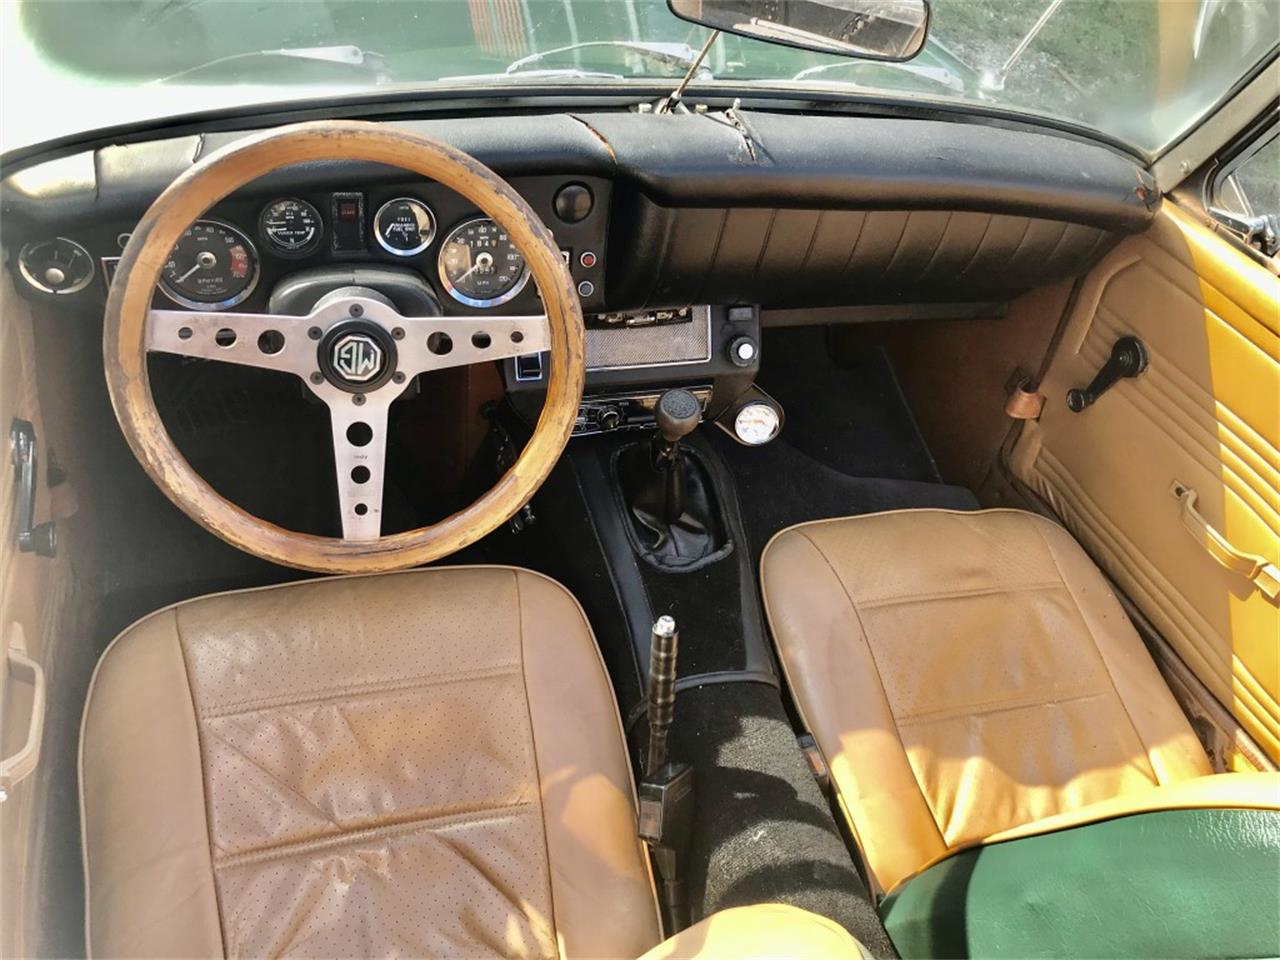 1977 MG Midget (CC-1417011) for sale in Clarksville, Georgia